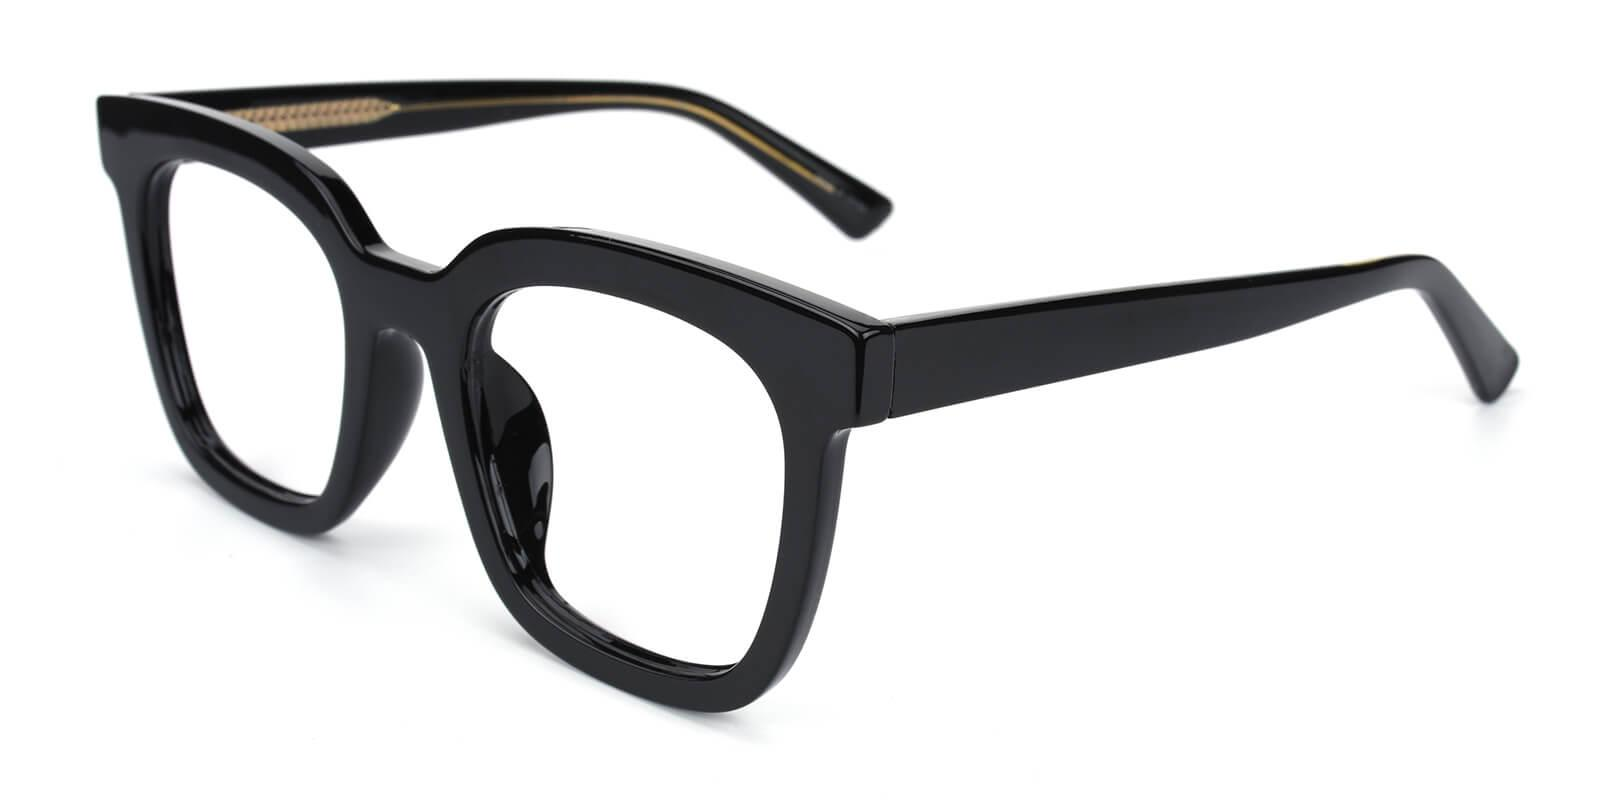 Vienna-Black-Square-Acetate-Eyeglasses-additional1